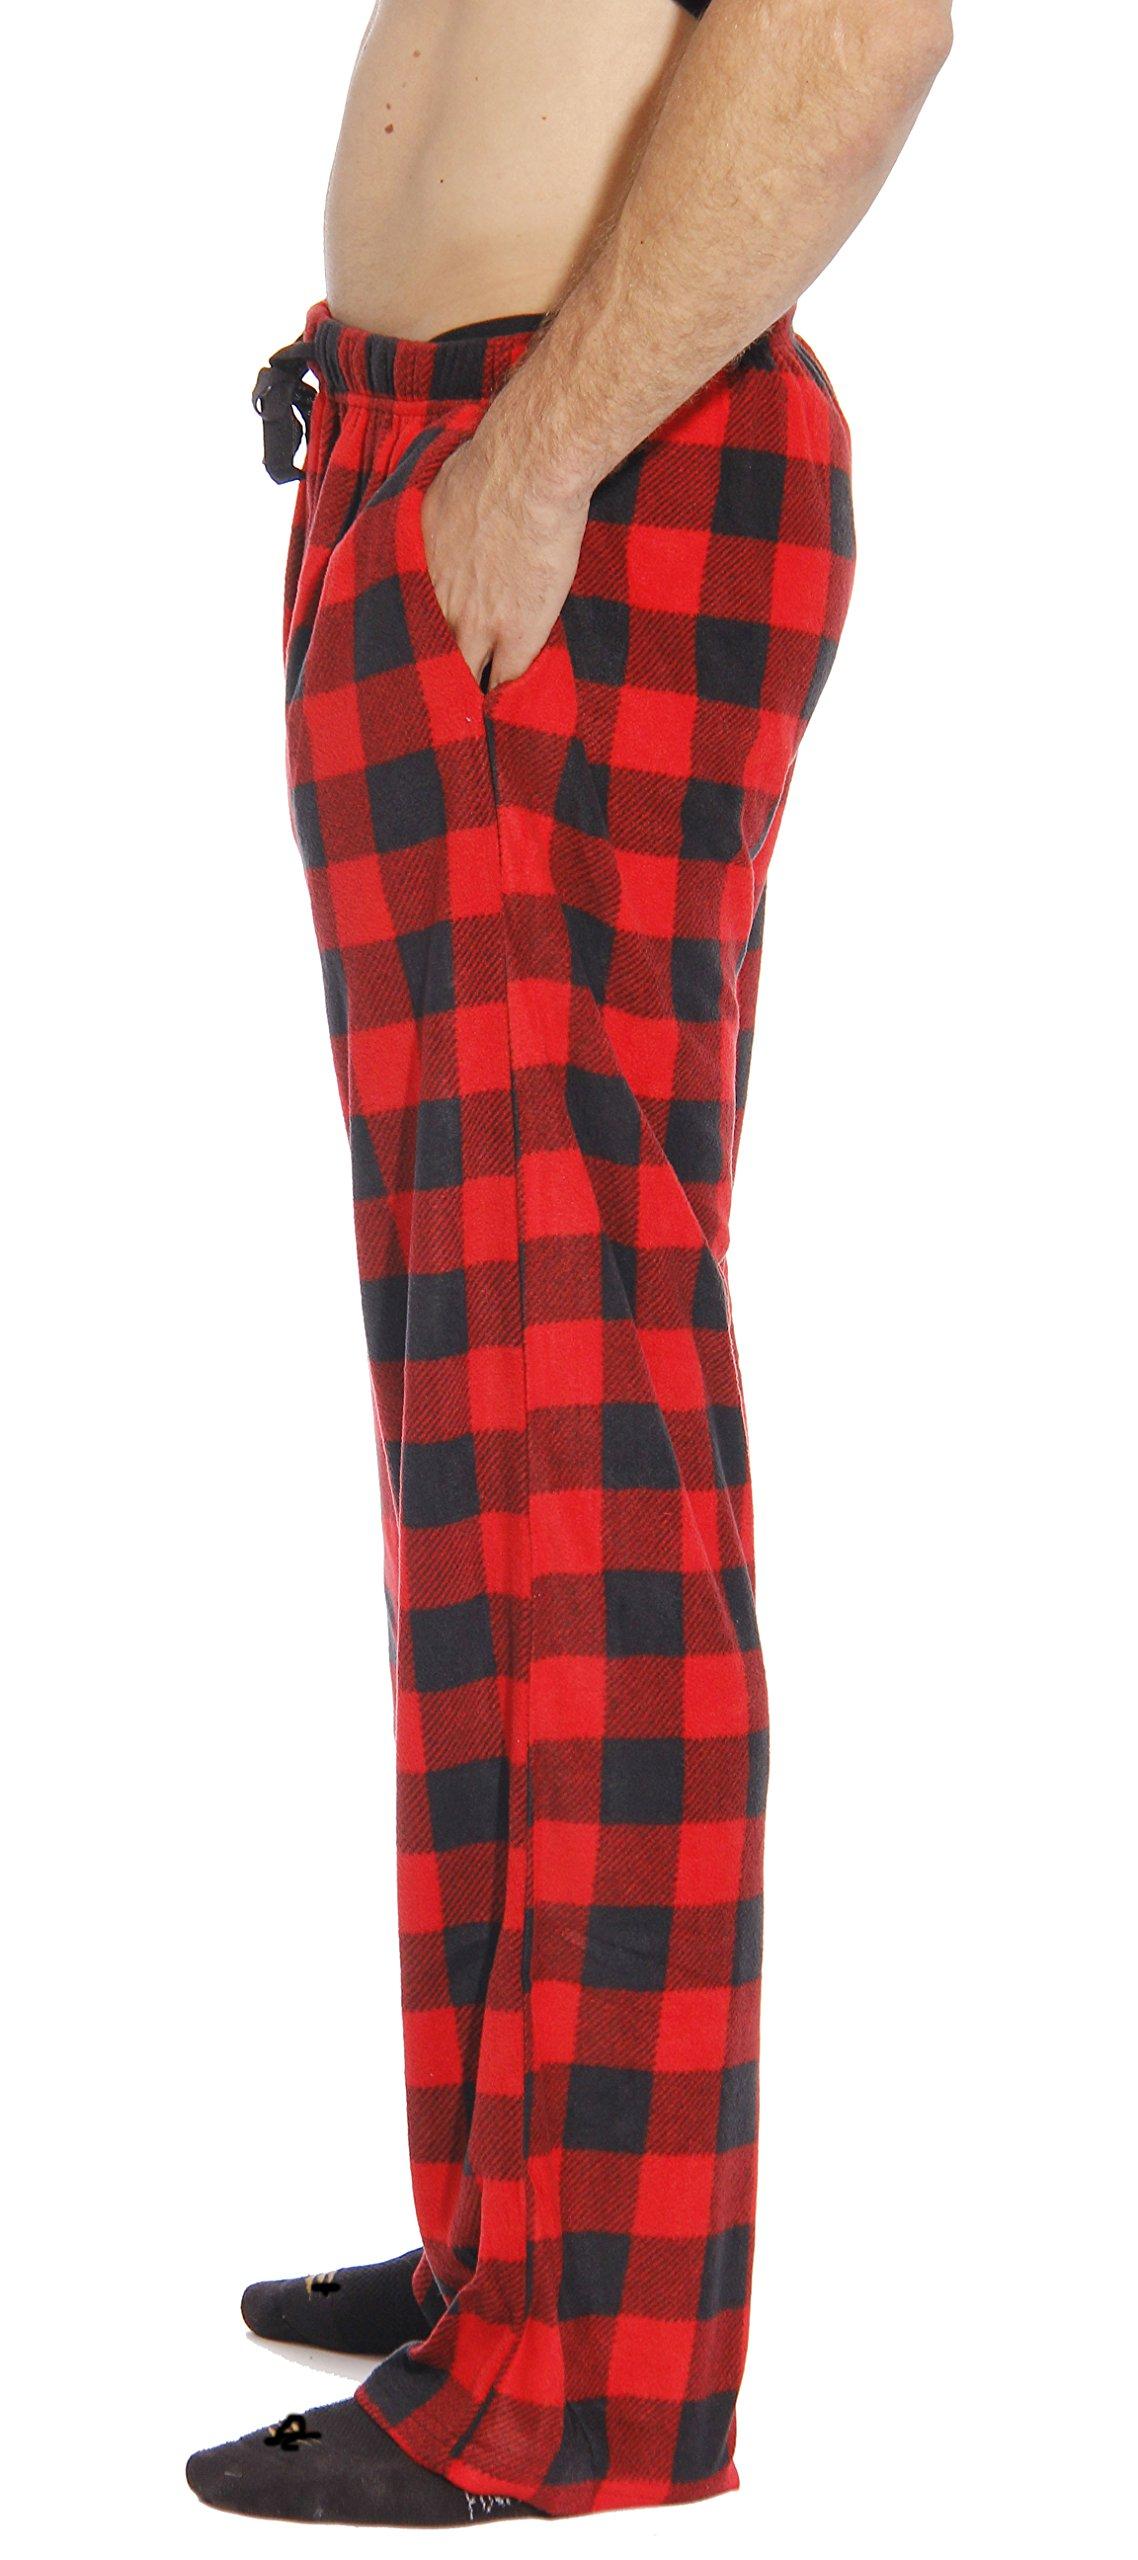 #FollowMe 45902-1A-M Polar Fleece Pajama Pants for Men/Sleepwear/PJs, Red Buffalo Plaid, Medium by #followme (Image #2)